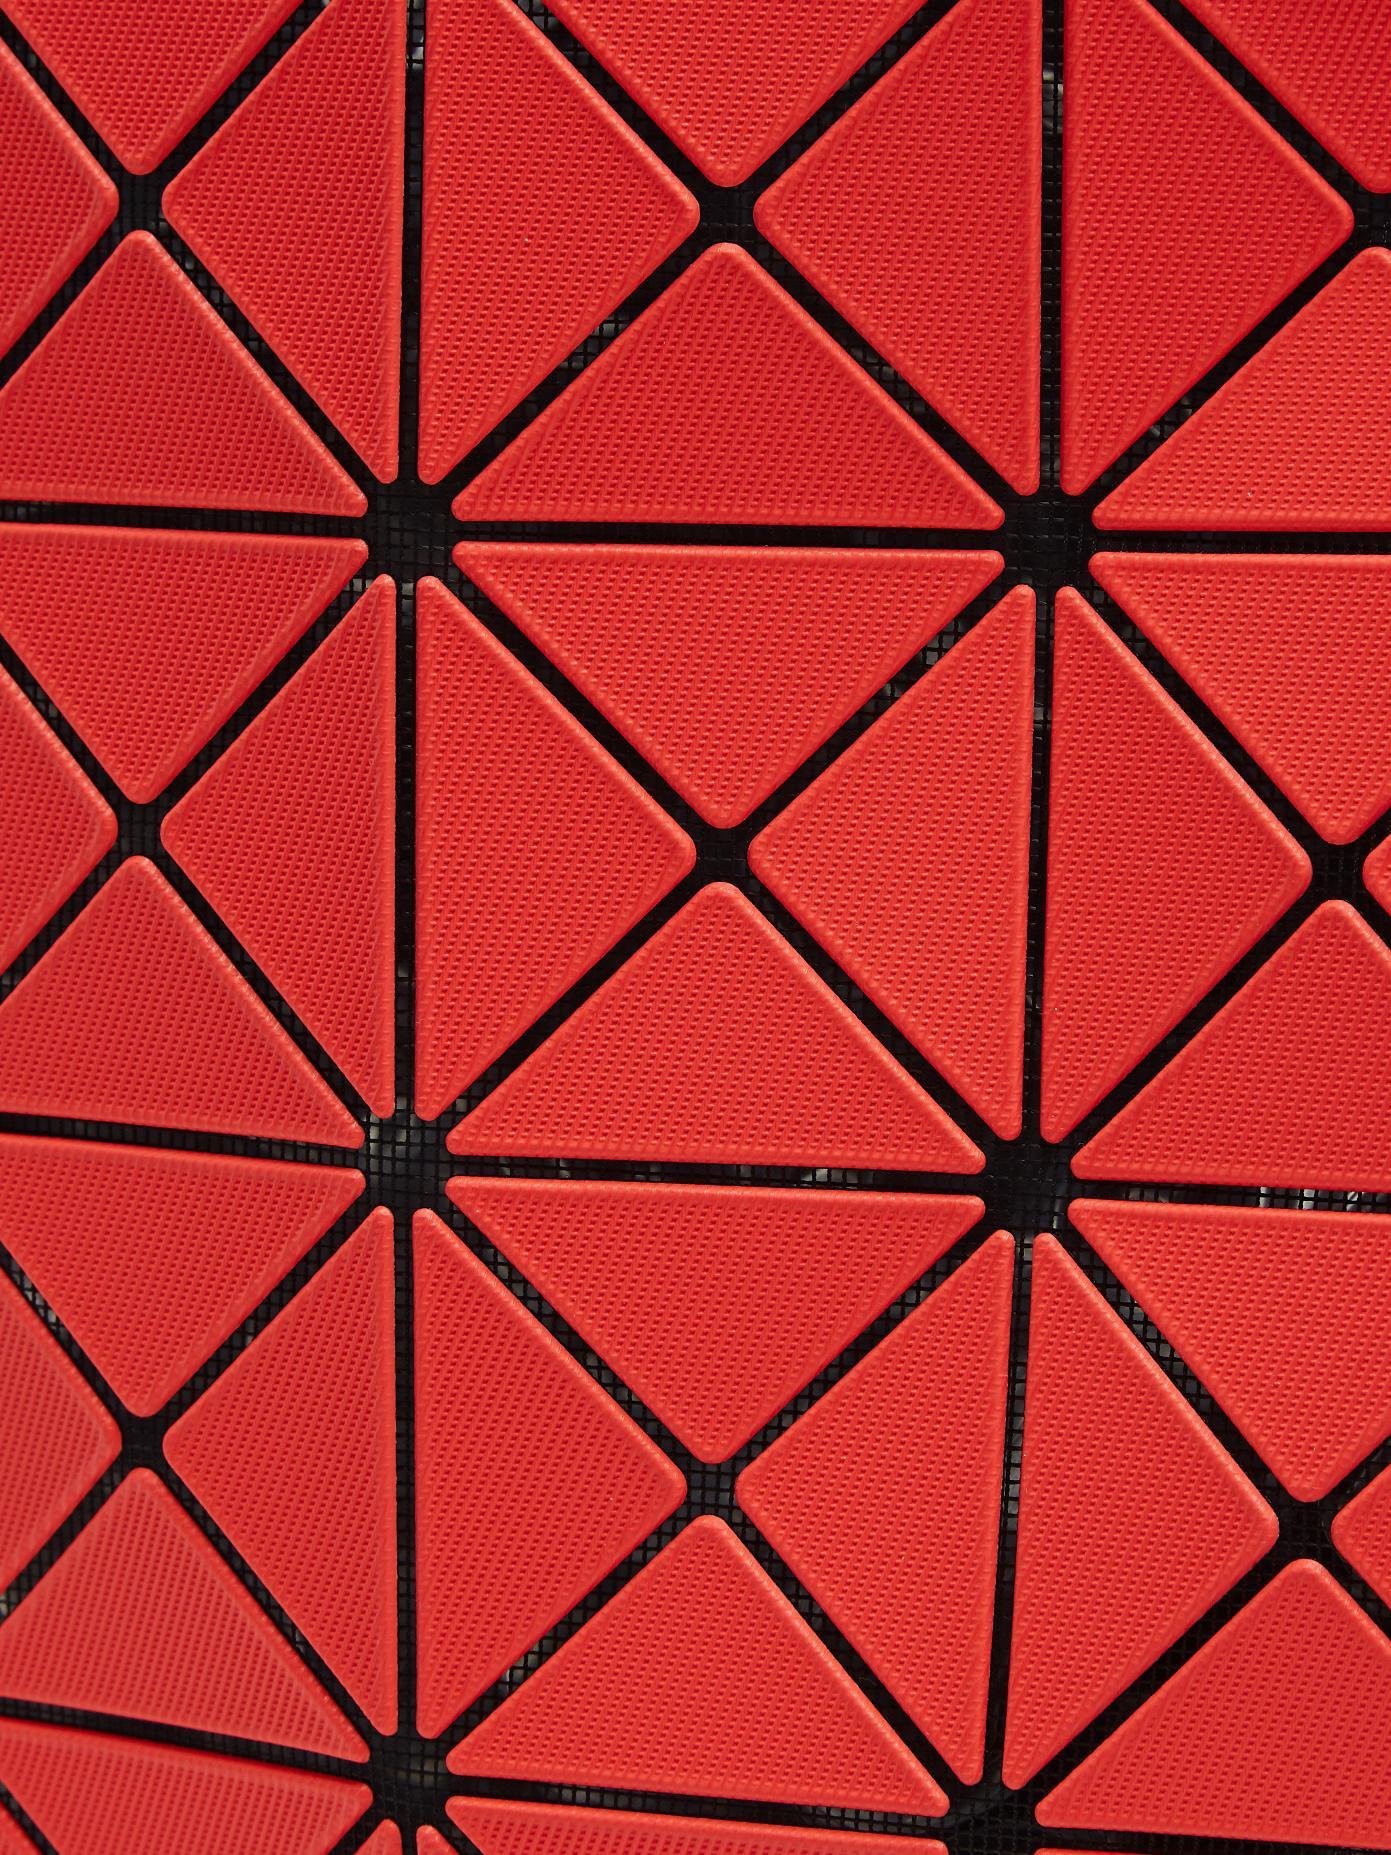 da4b4227e7 Lyst - Bao Bao Issey Miyake Lucent Twill Tote in Red